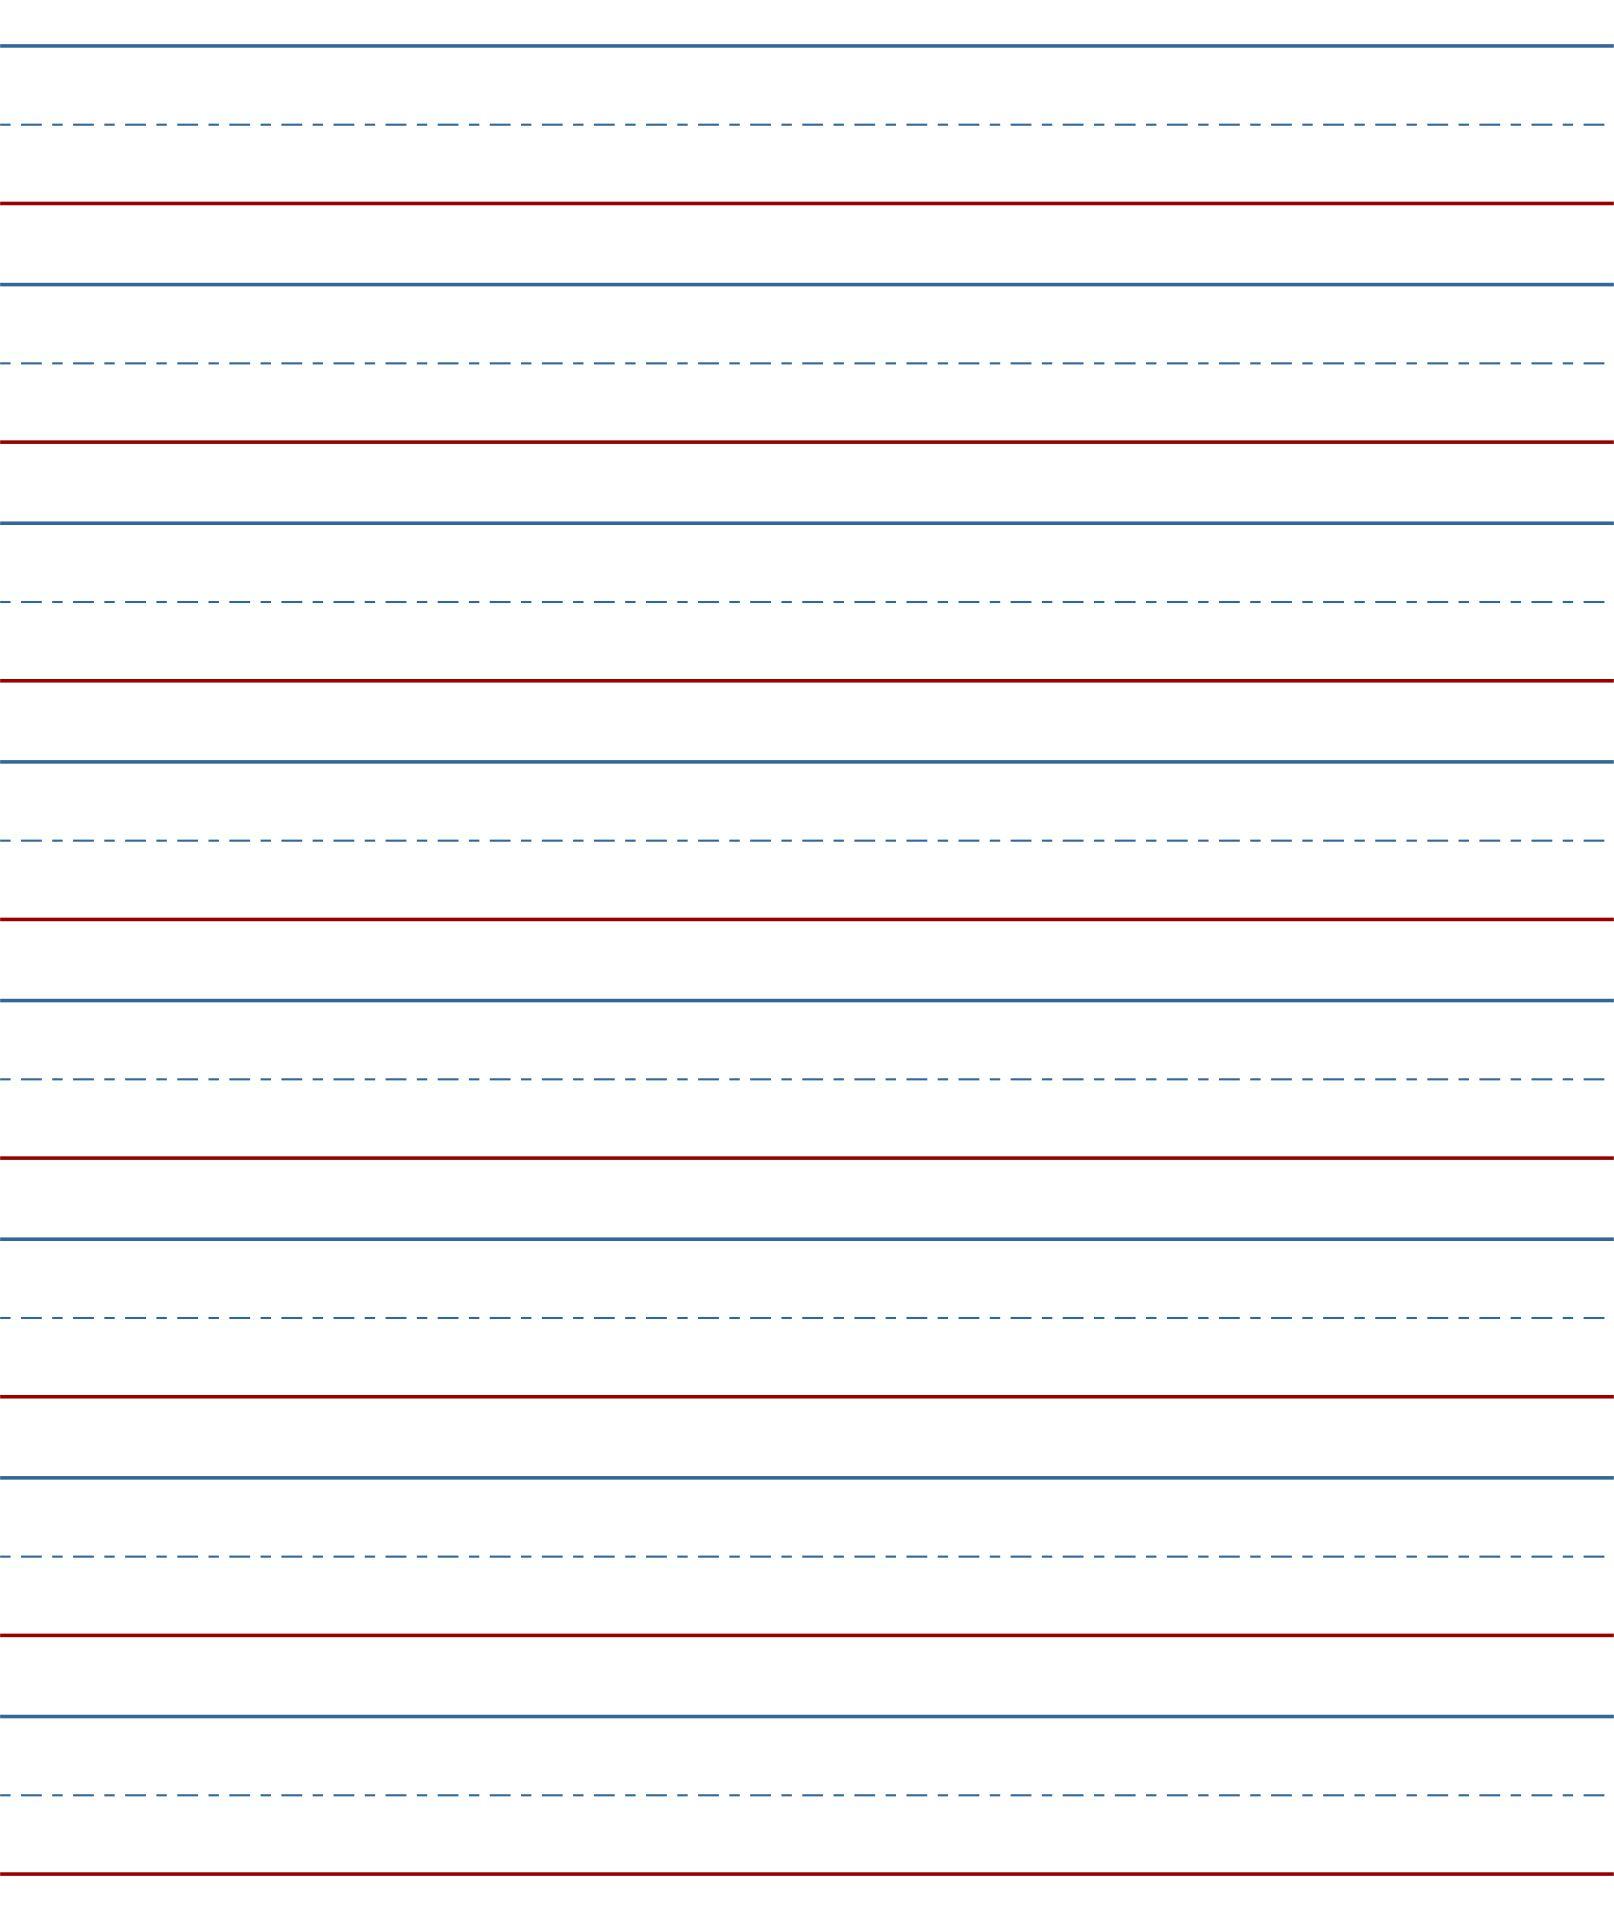 math worksheet : printable tracing paper kindergarten  k5 worksheets : Kindergarten Alphabet Worksheets Free